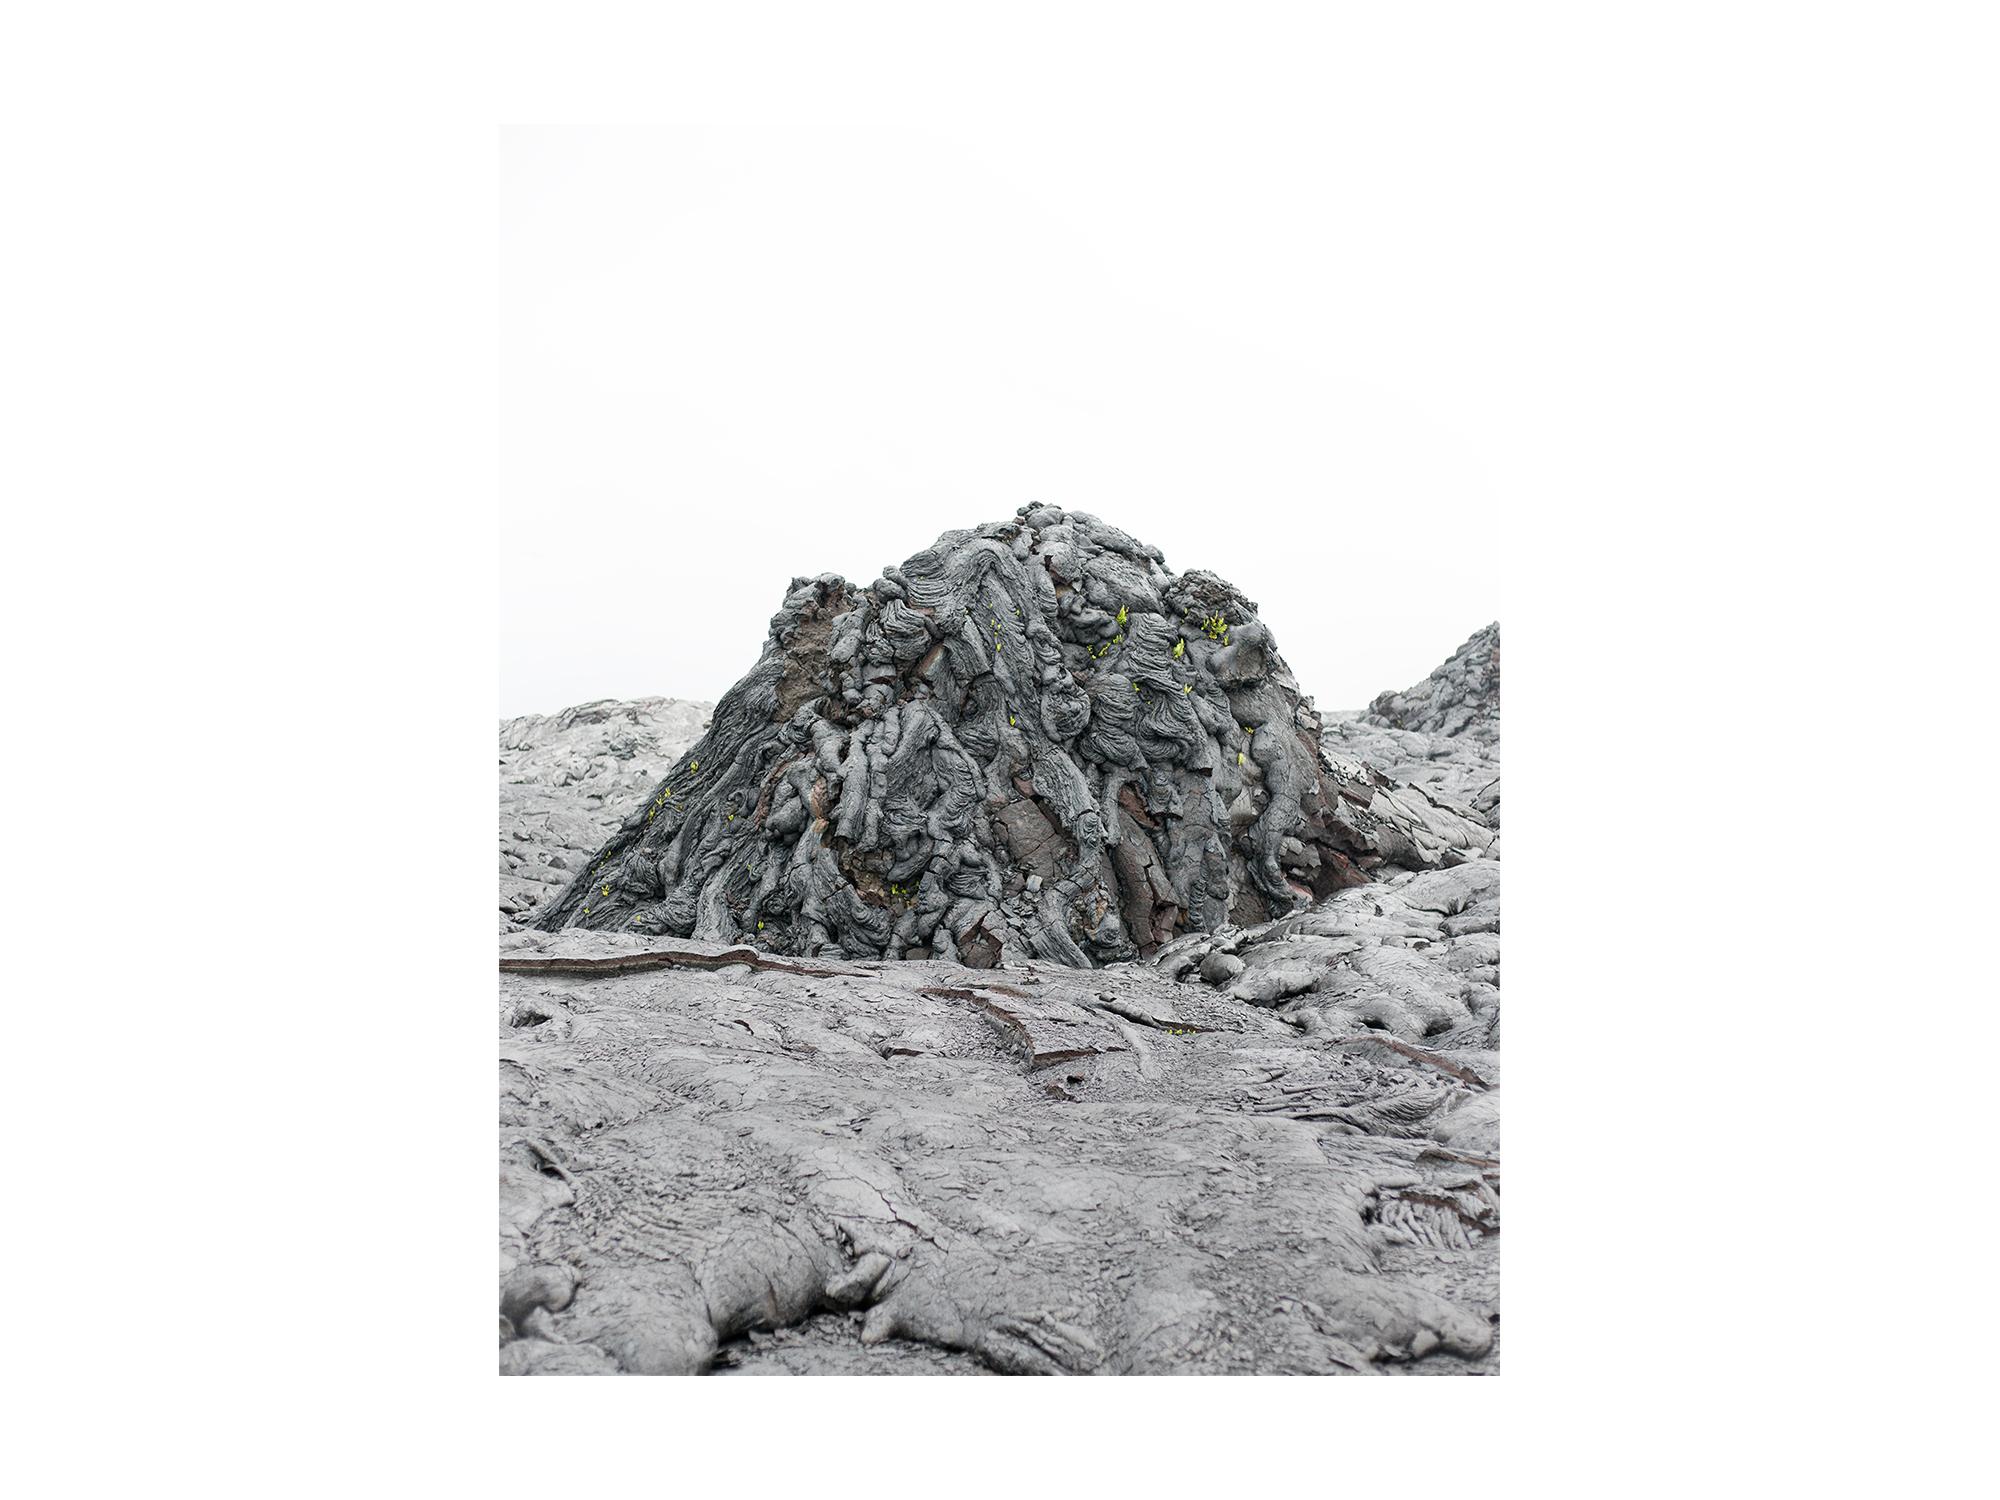 Kieren Seymour   Pile , 2017 photograph on archival rag 71 x 61cm   ARTIST BIO